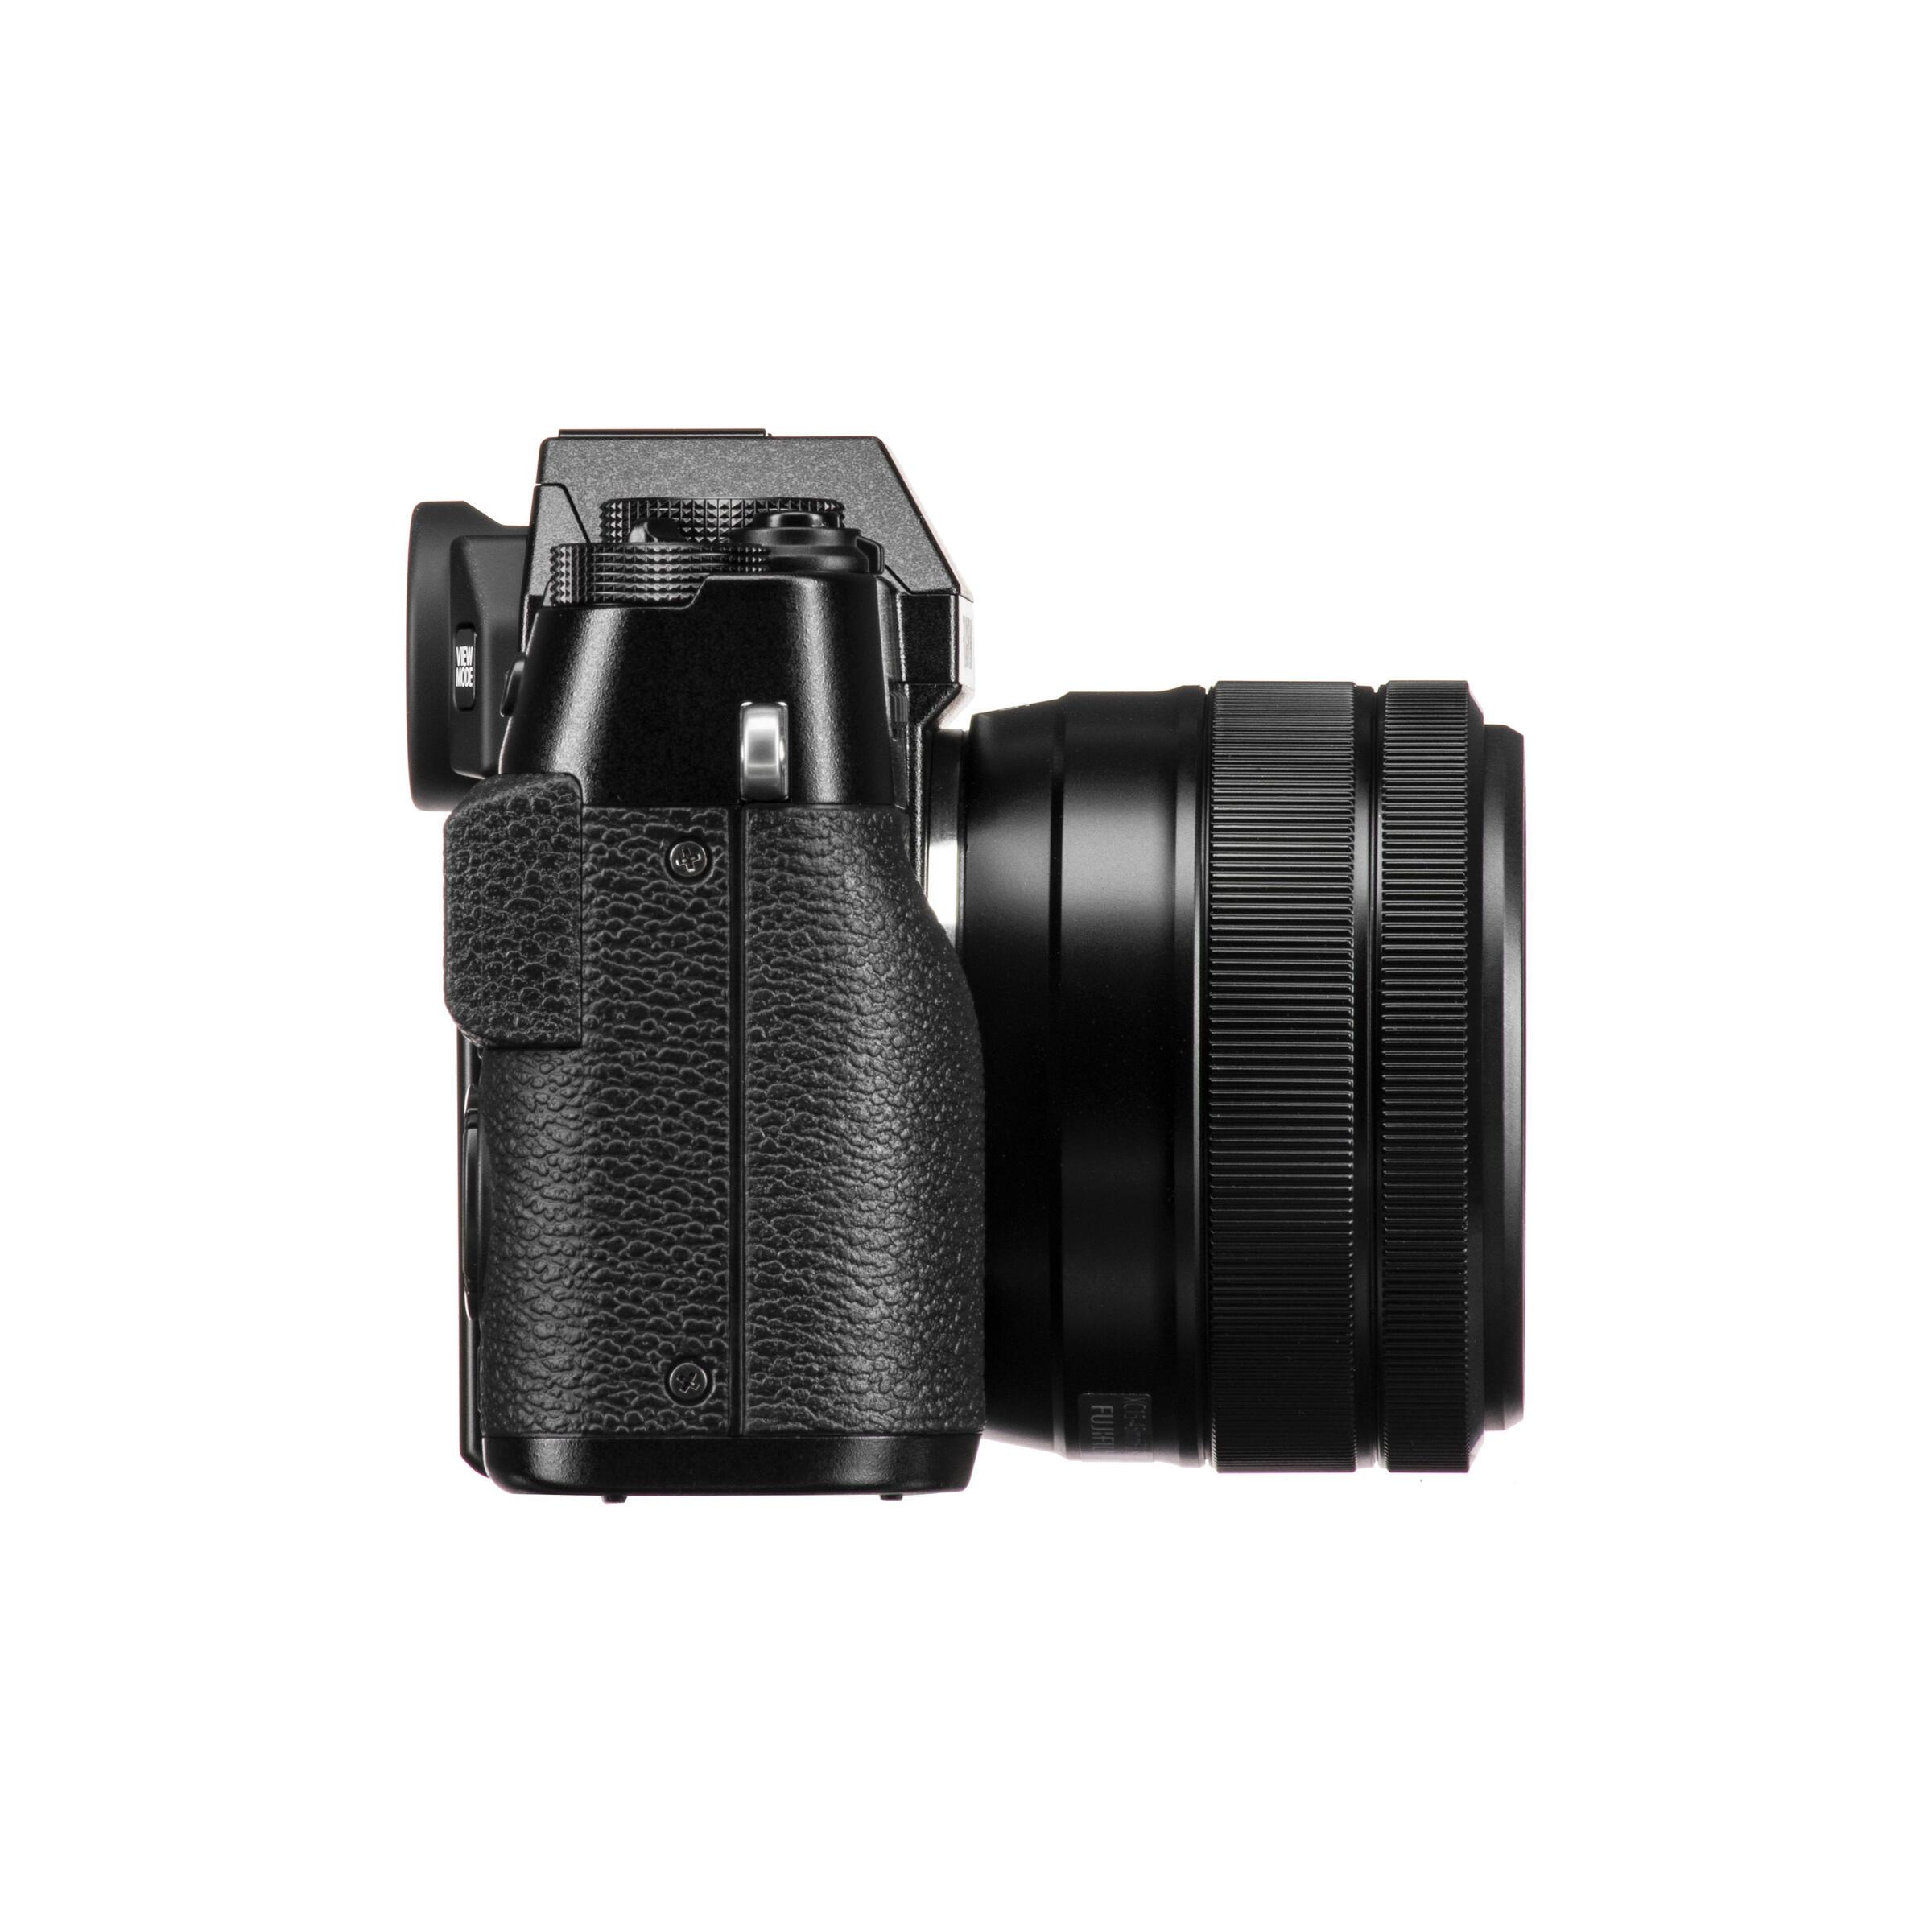 Fujifilm X-T20 + XC 15-45mm : Schwarz